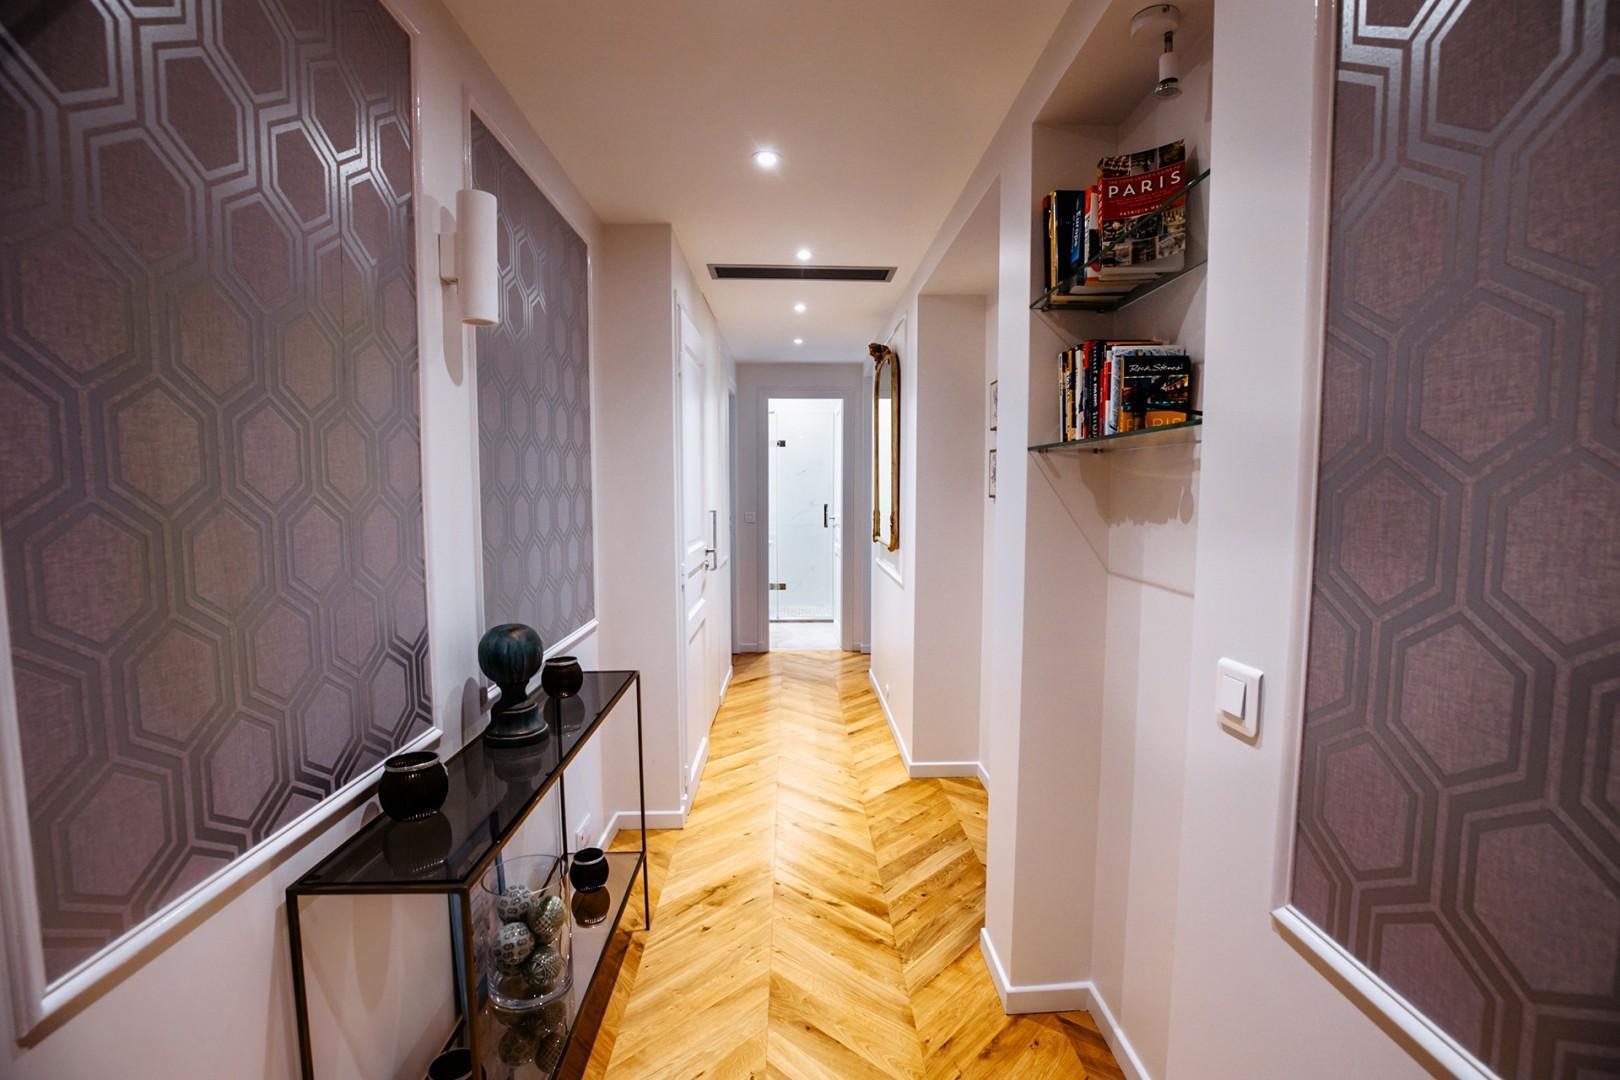 Elegant entrance to the apartment